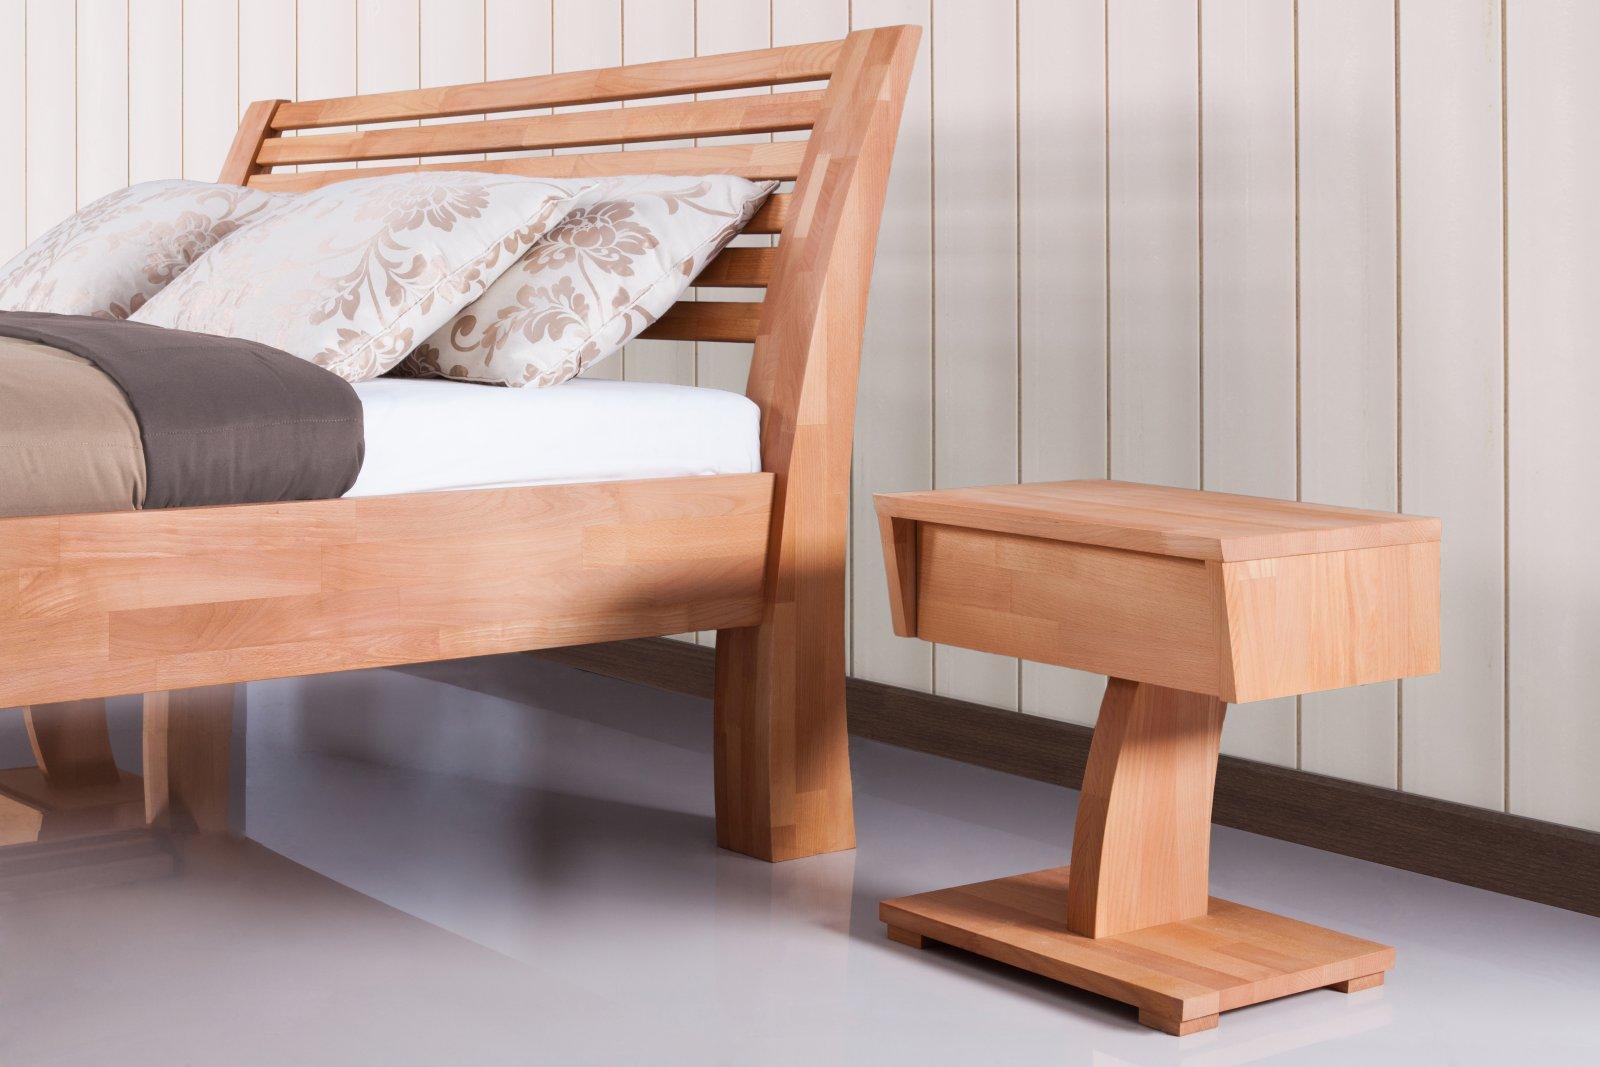 Szafka nocna BARON z litego drewna